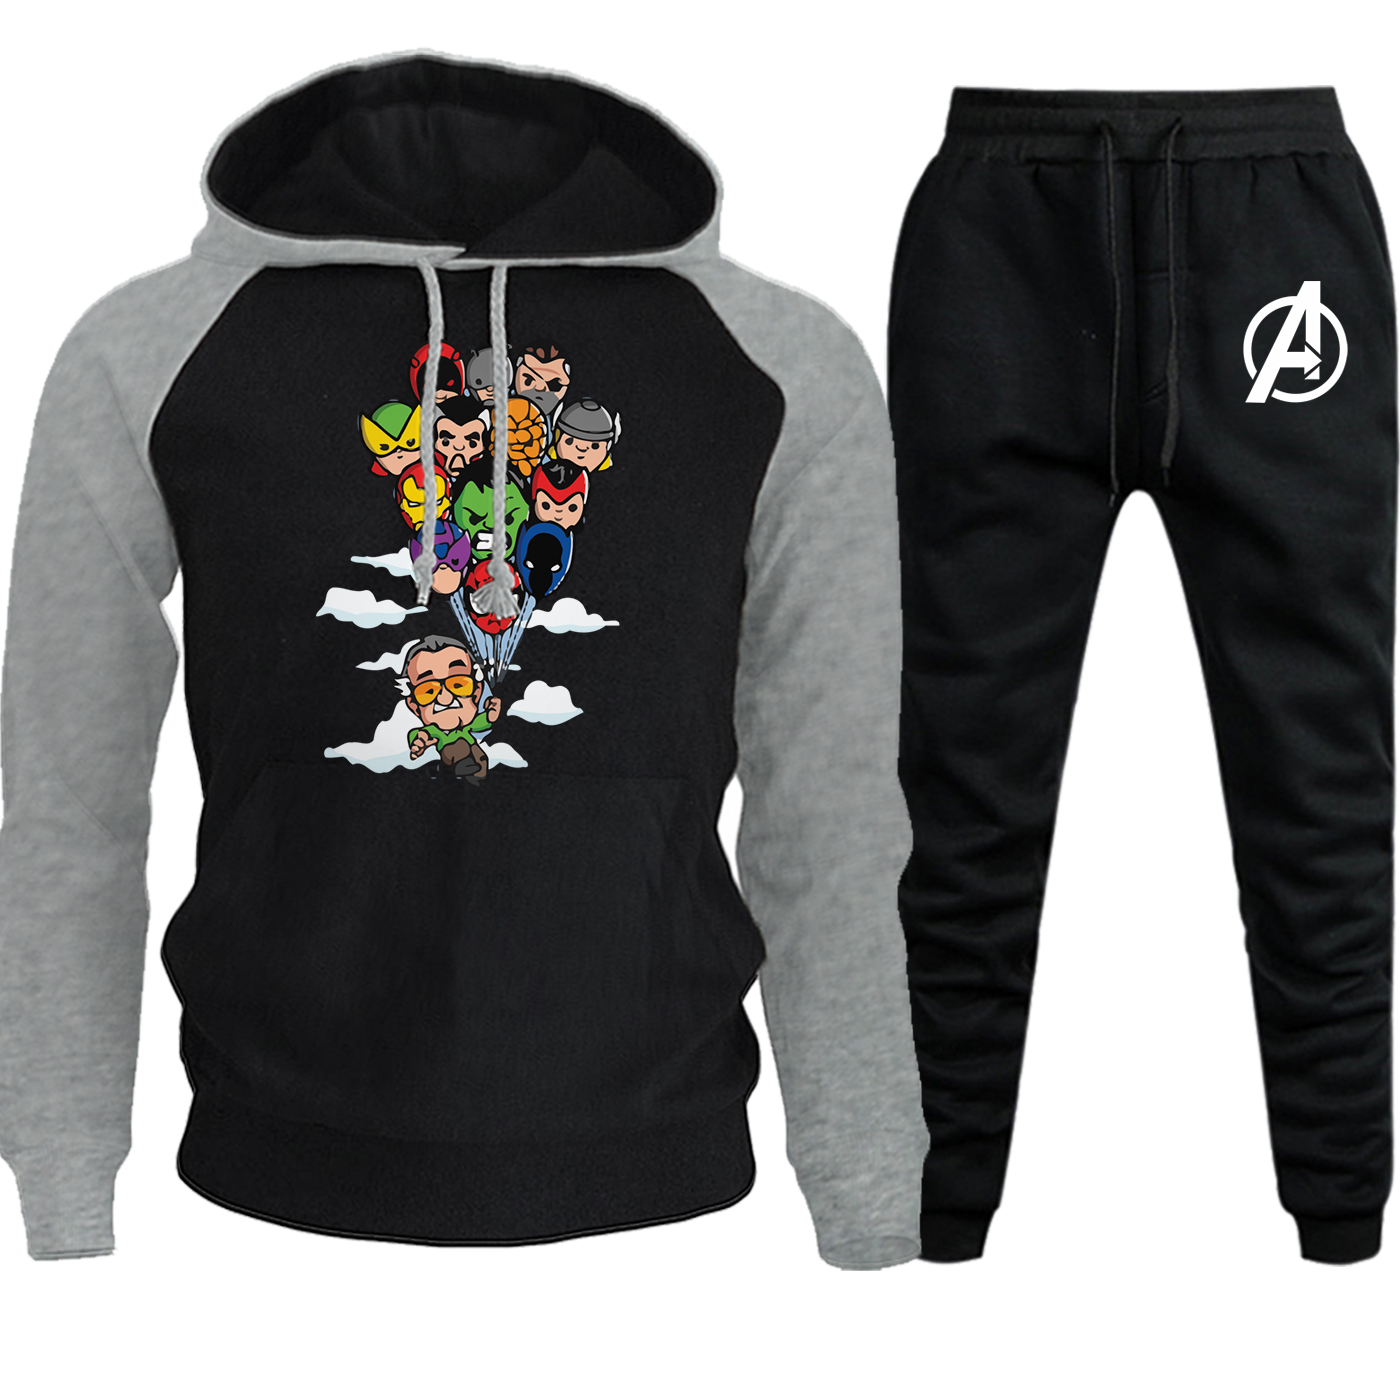 Funny The Avengers Autumn Winter 2019 Streetwear Men Raglan Hooded Marvel Hip Hop Casual Suit Fleece Hoodies+Pants 2 Piece Set